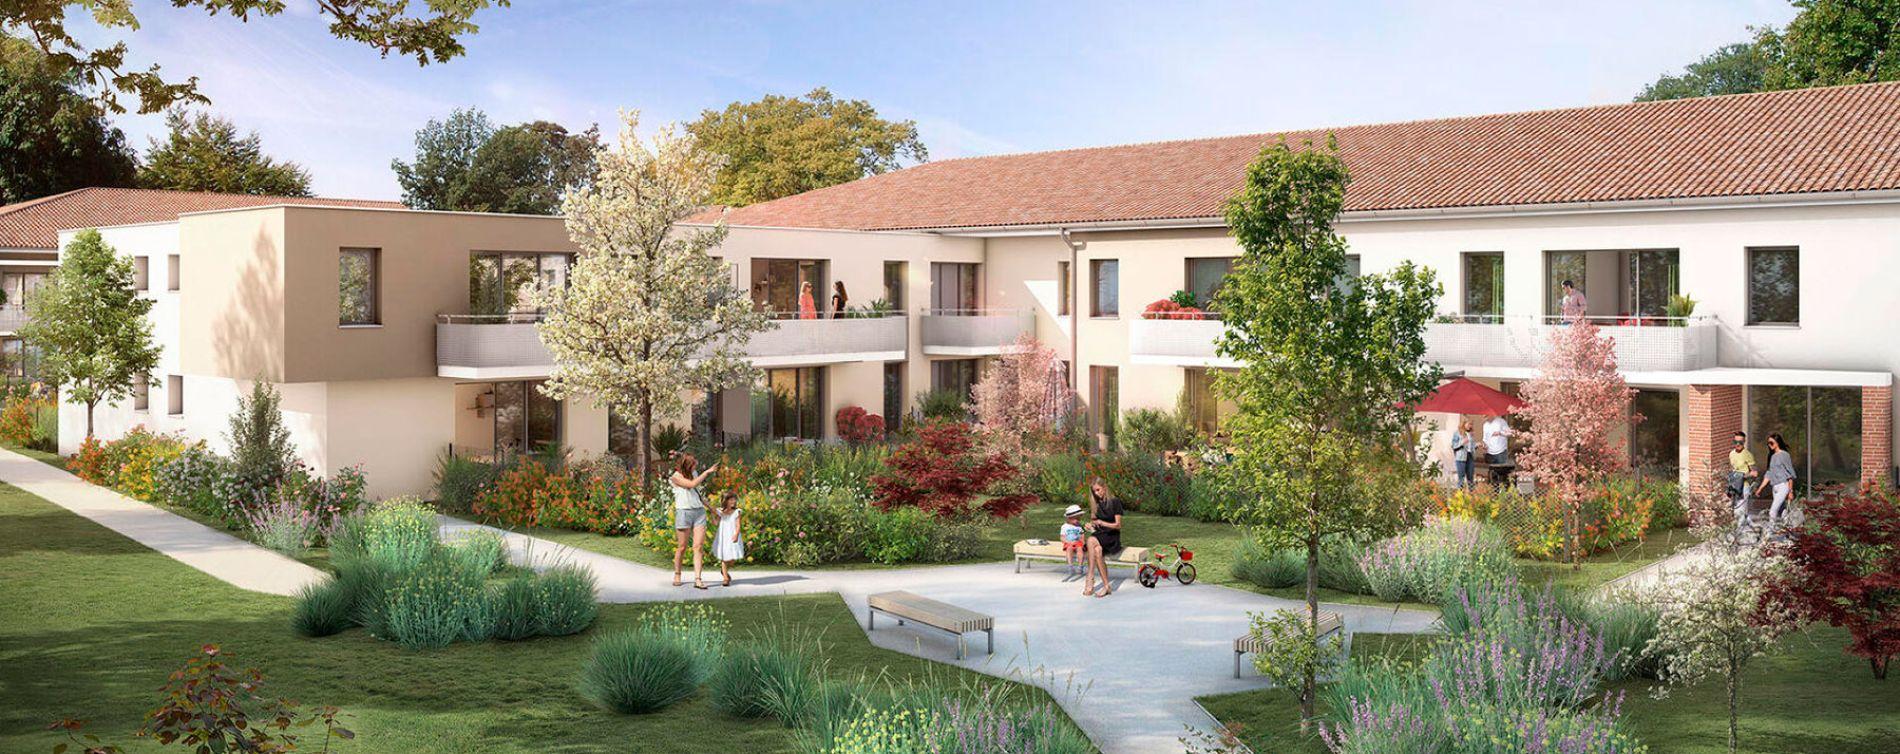 Mondonville : programme immobilier neuve « Programme immobilier n°218335 »